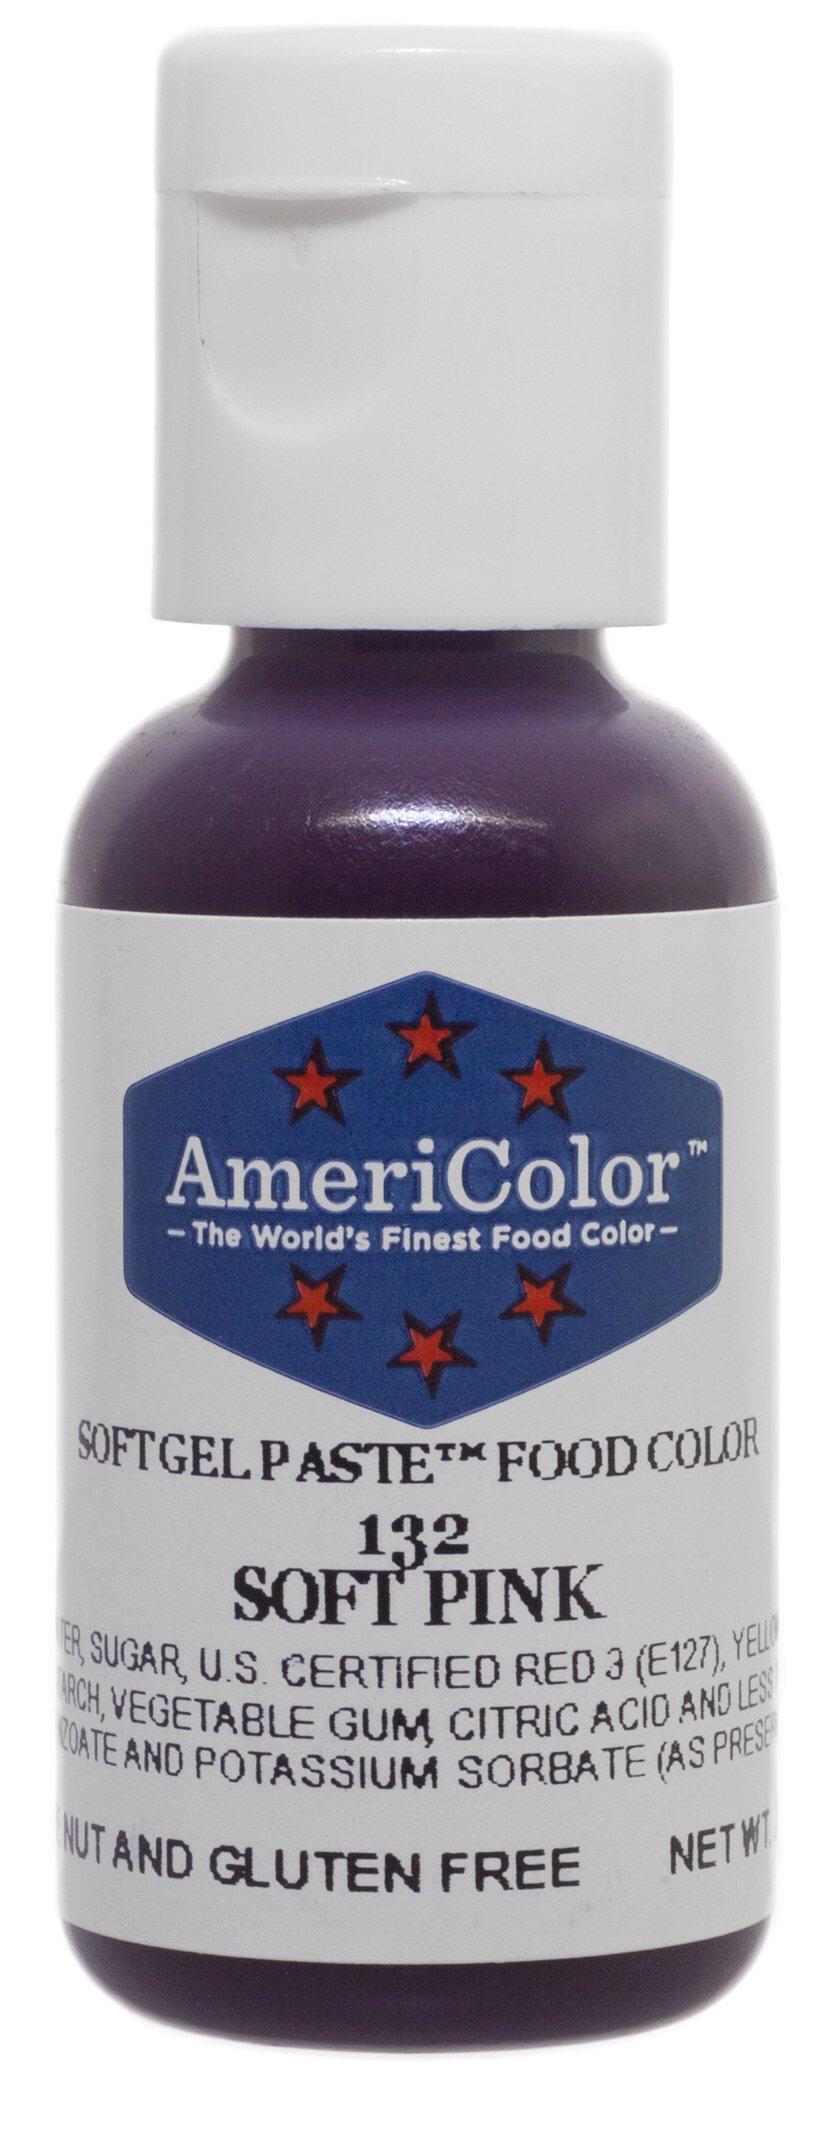 Americolor Soft Gel Paste Food Color, 3/4-Ounce, Soft Pink